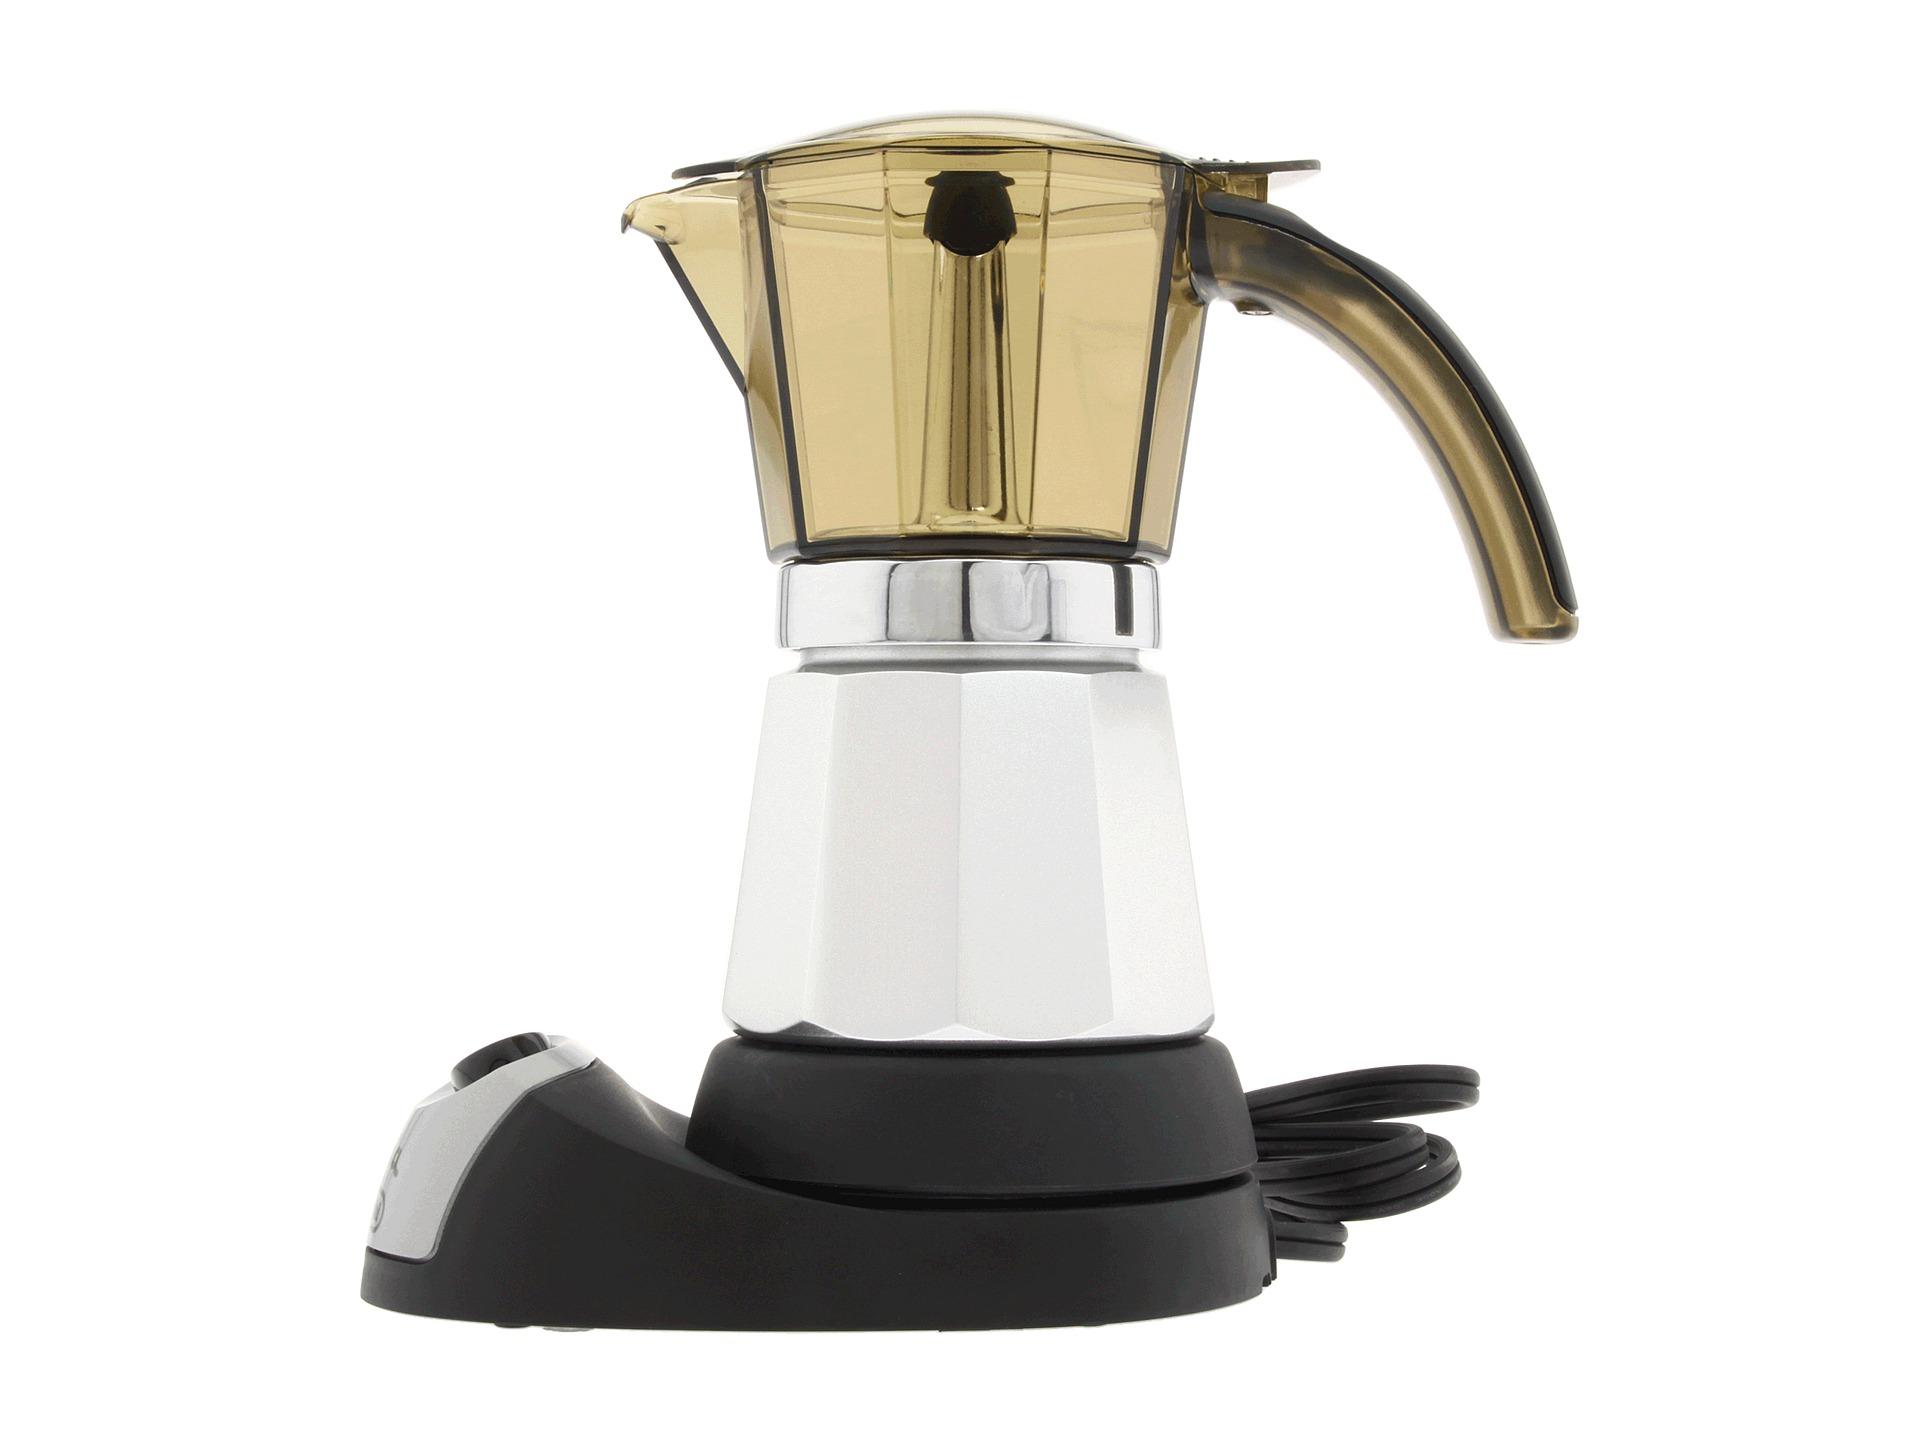 Moka Coffee Maker Electric : No results for delonghi emk6 electric moka espresso maker - Search Zappos.com